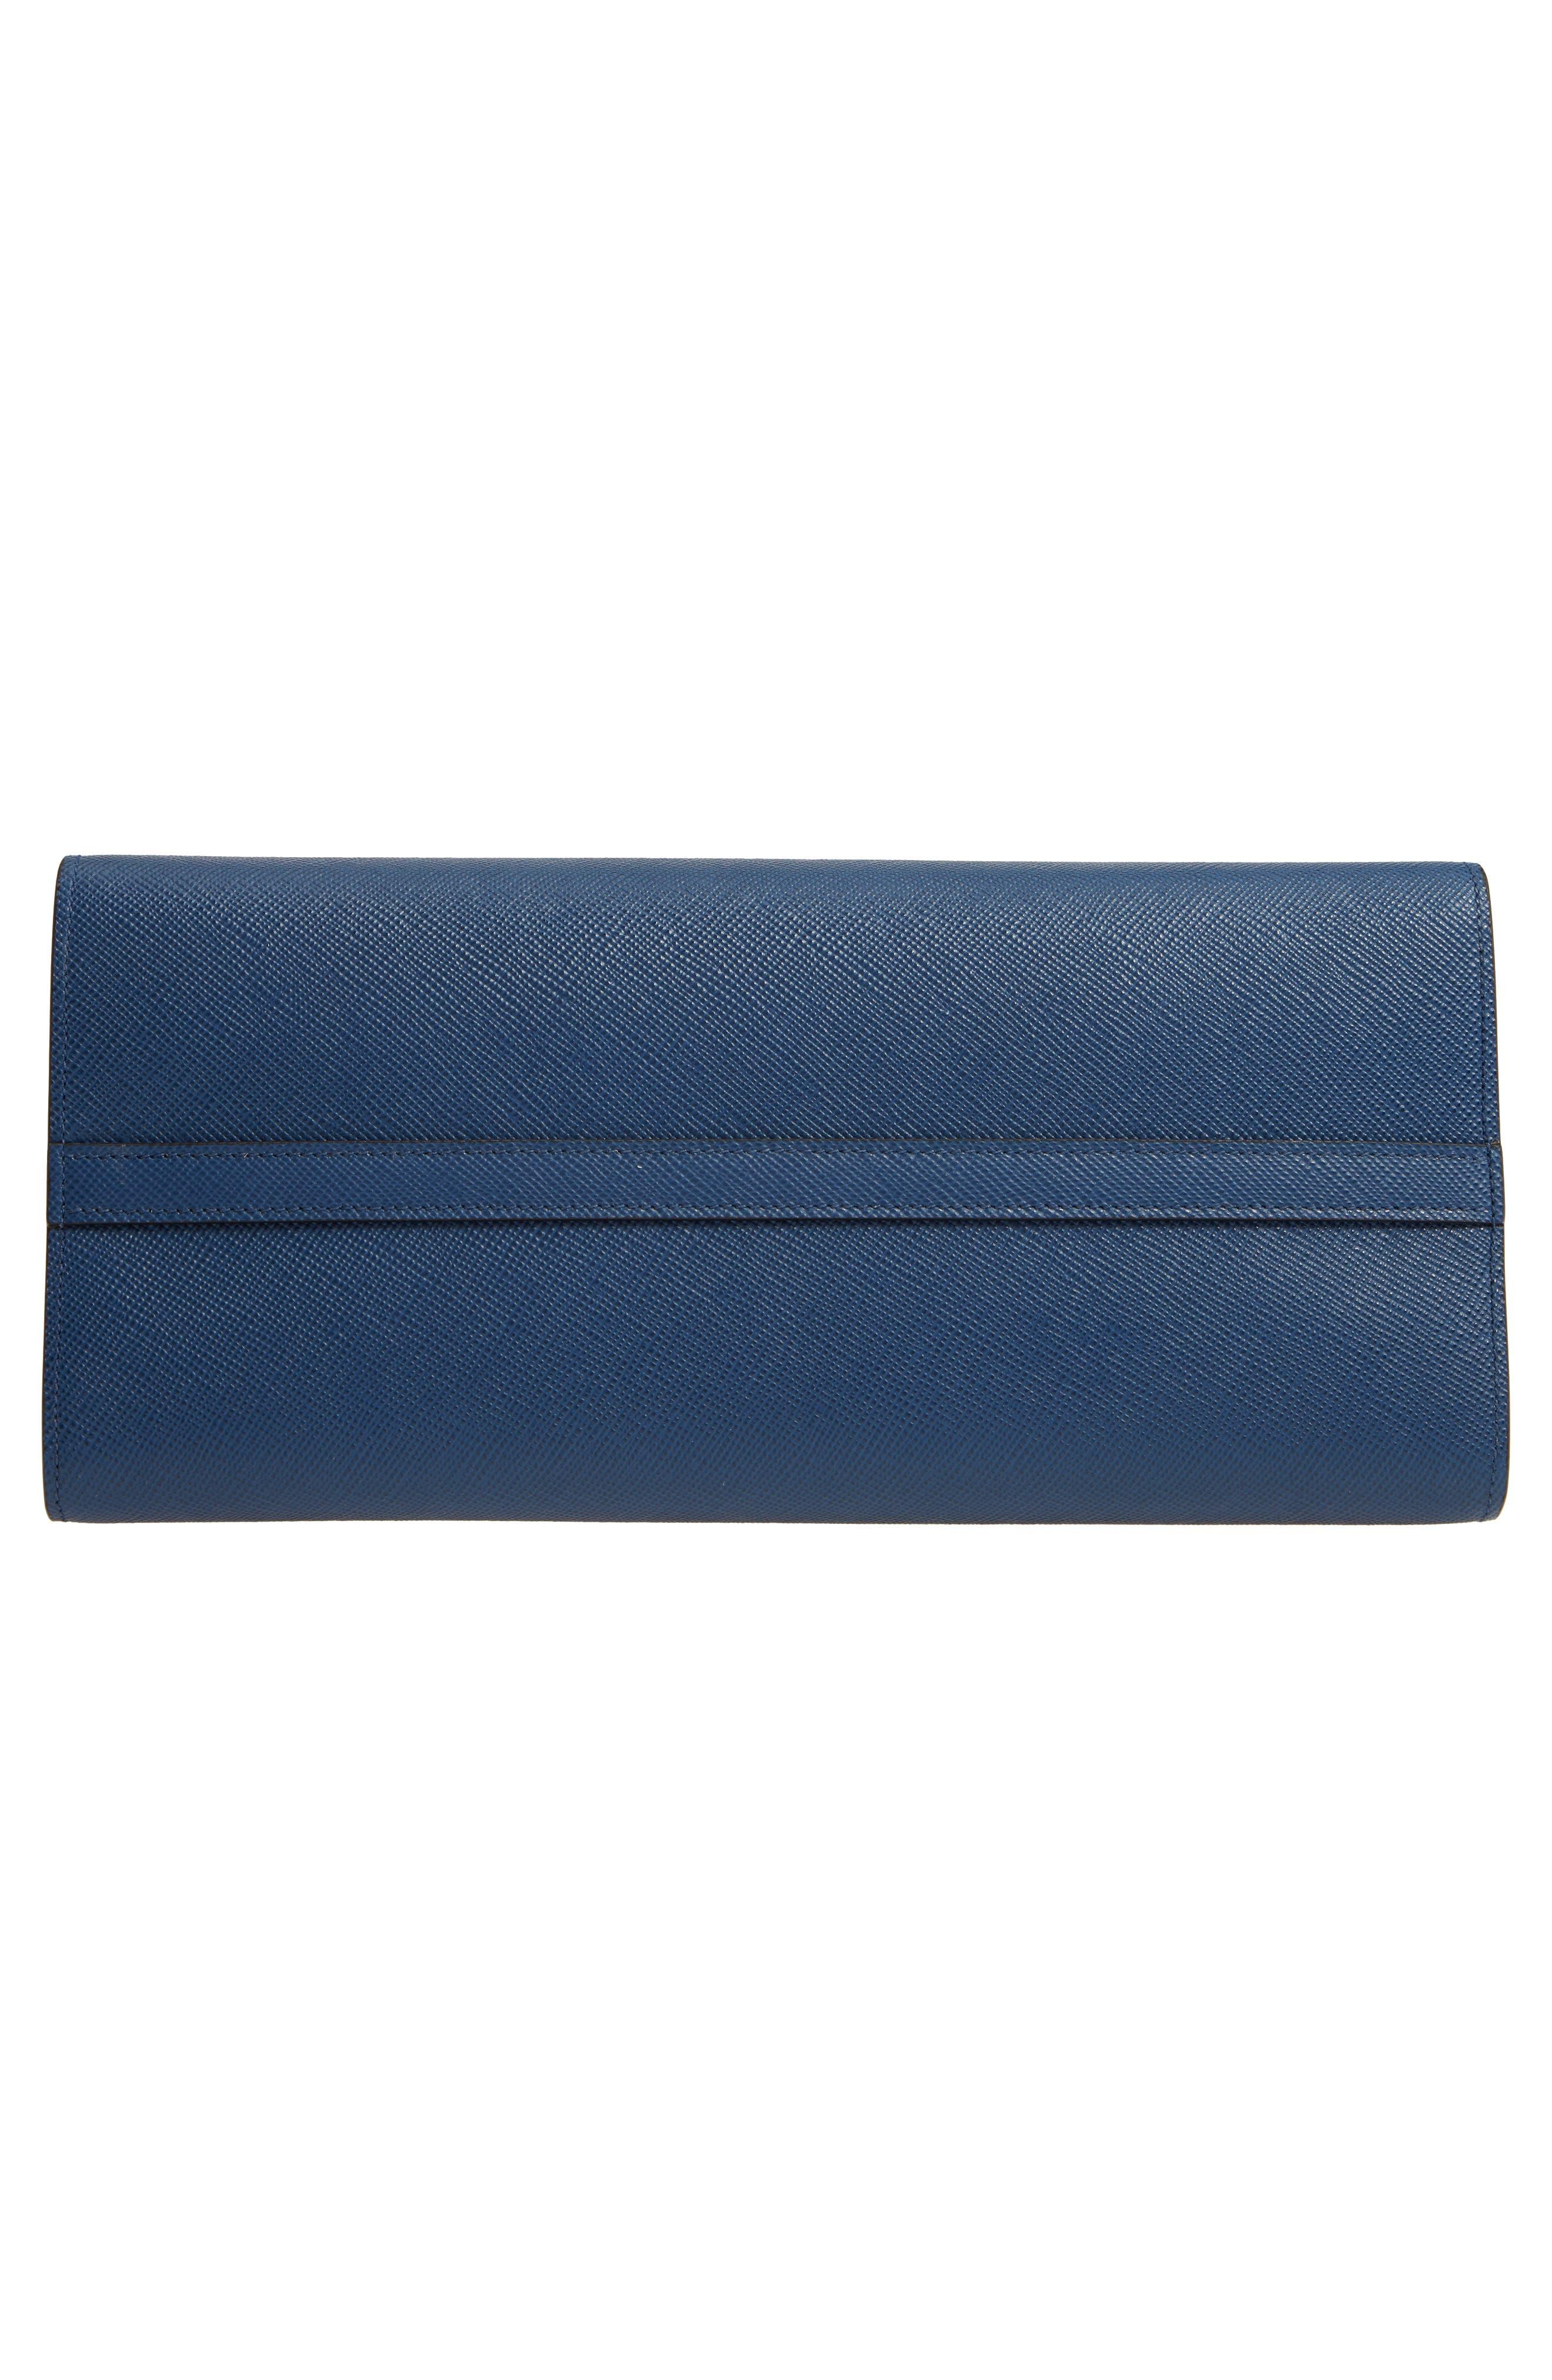 Large Monochrome Saffiano Tote,                             Alternate thumbnail 4, color,                             Bluette